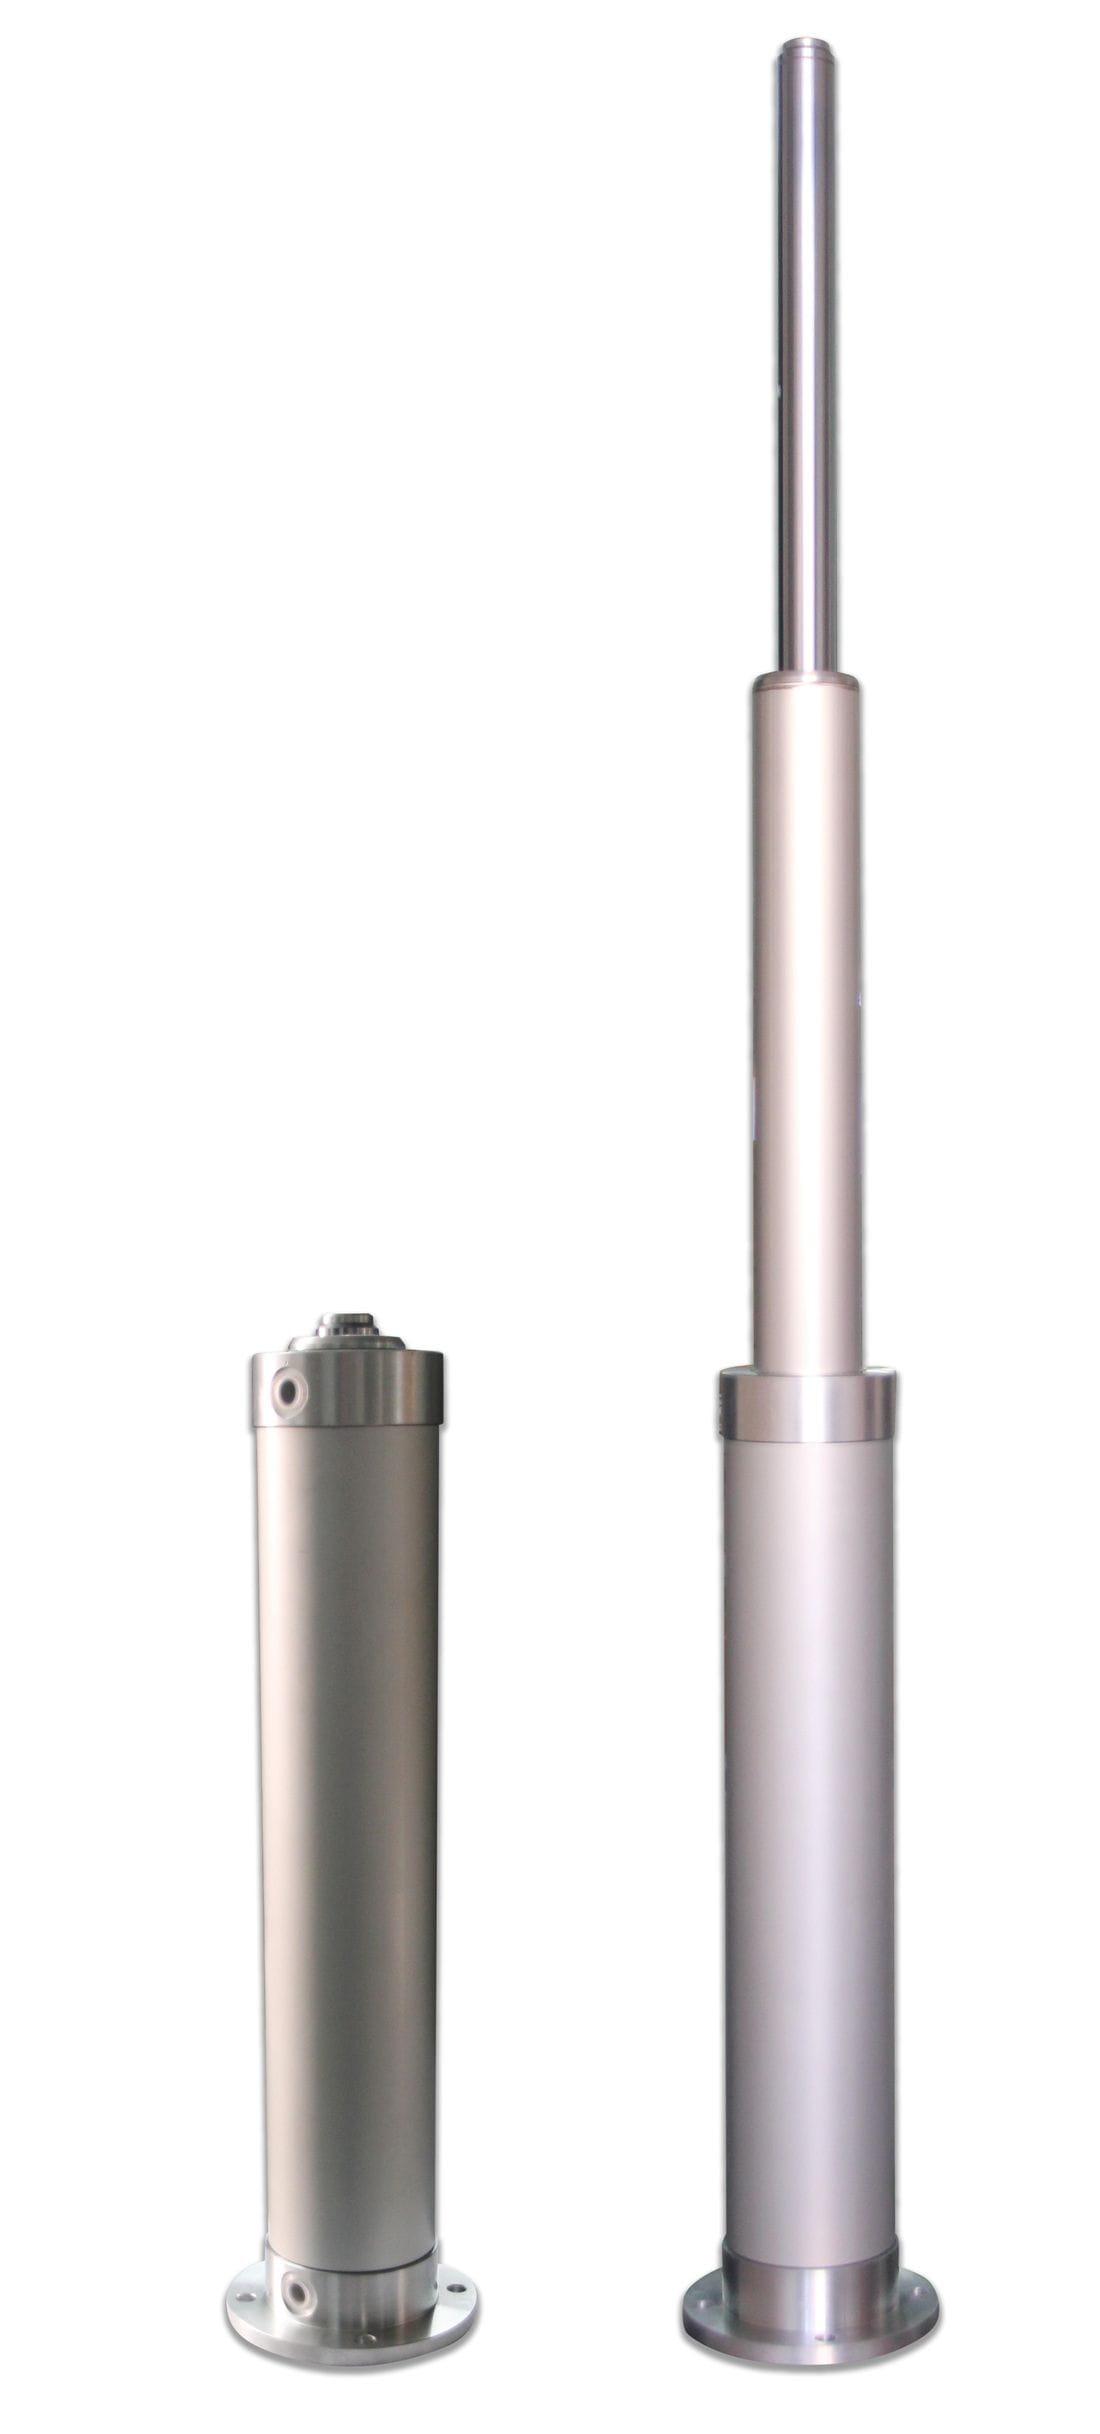 Cilindro neumático telescópico